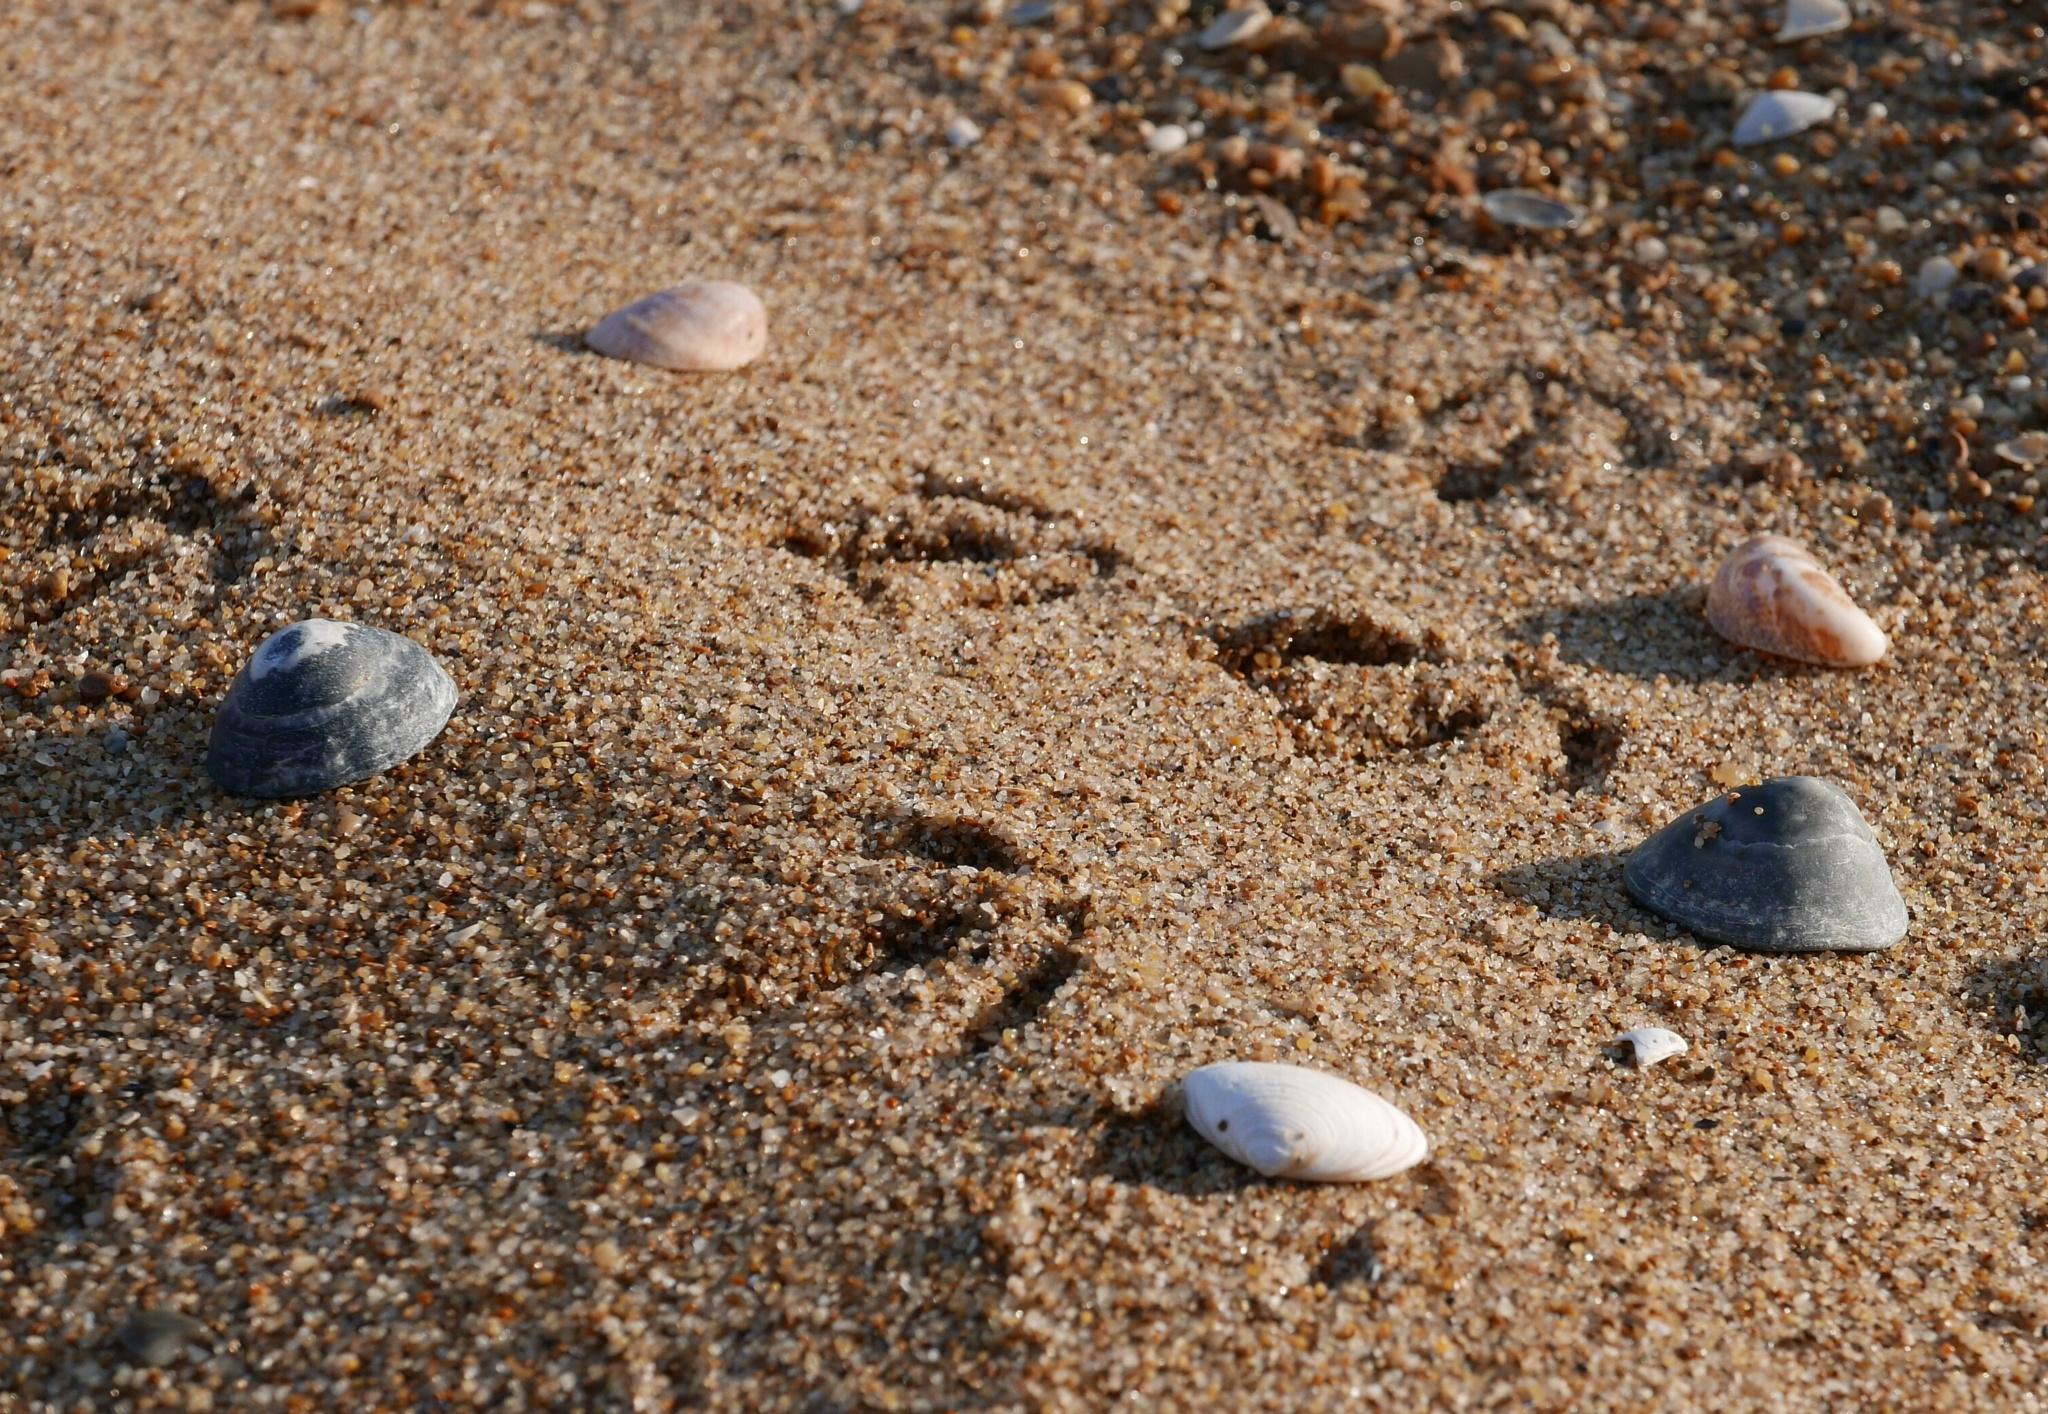 Shells and bird footprint  by lallemand